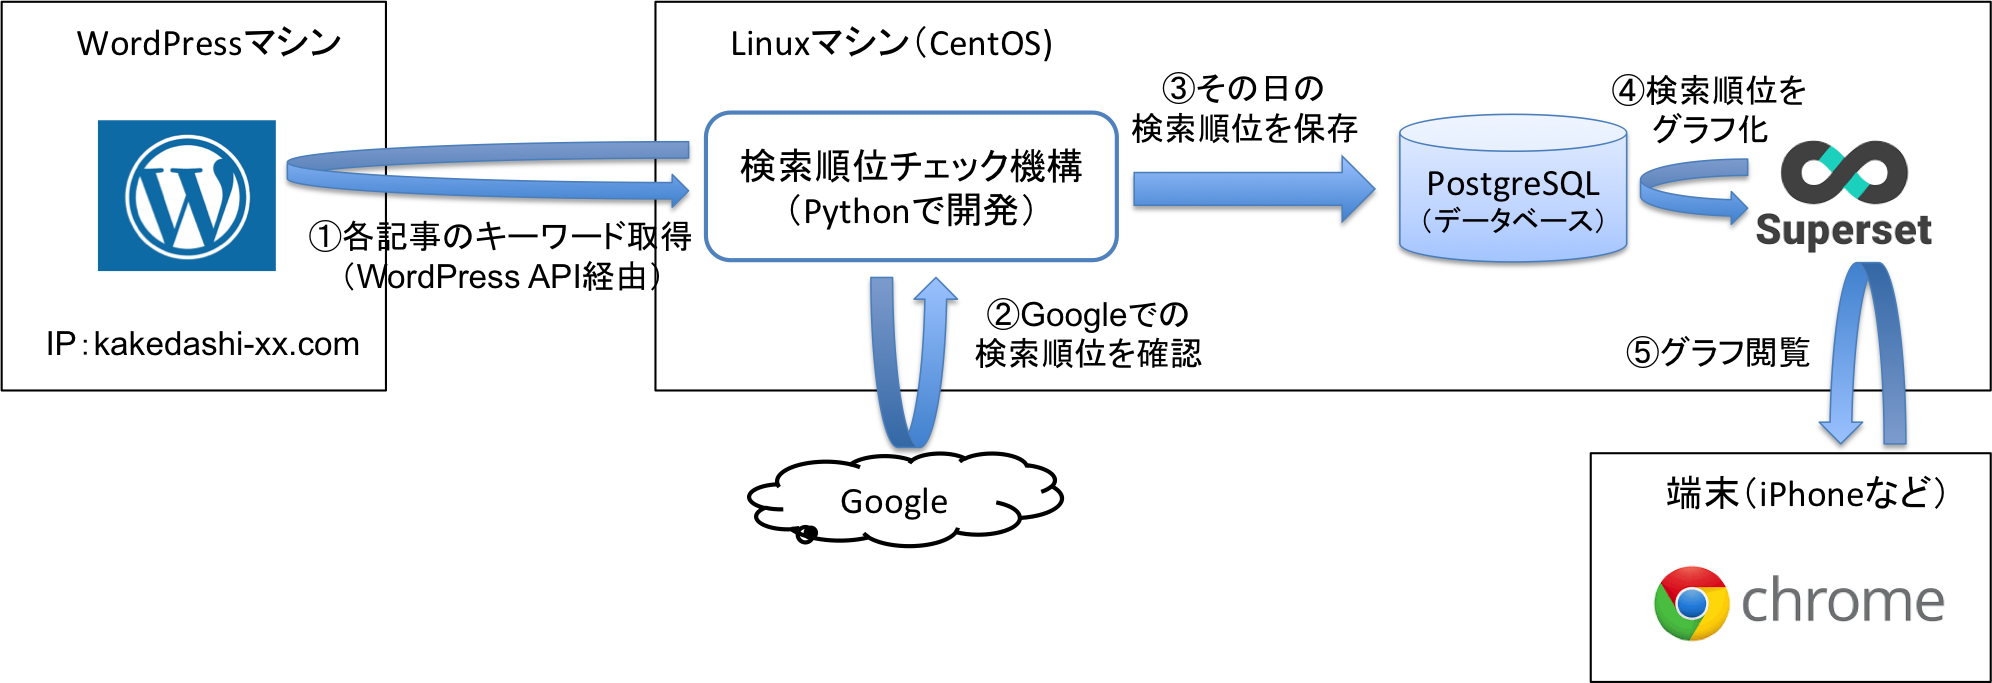 pythonで自作する検索順位チェックツールの構成